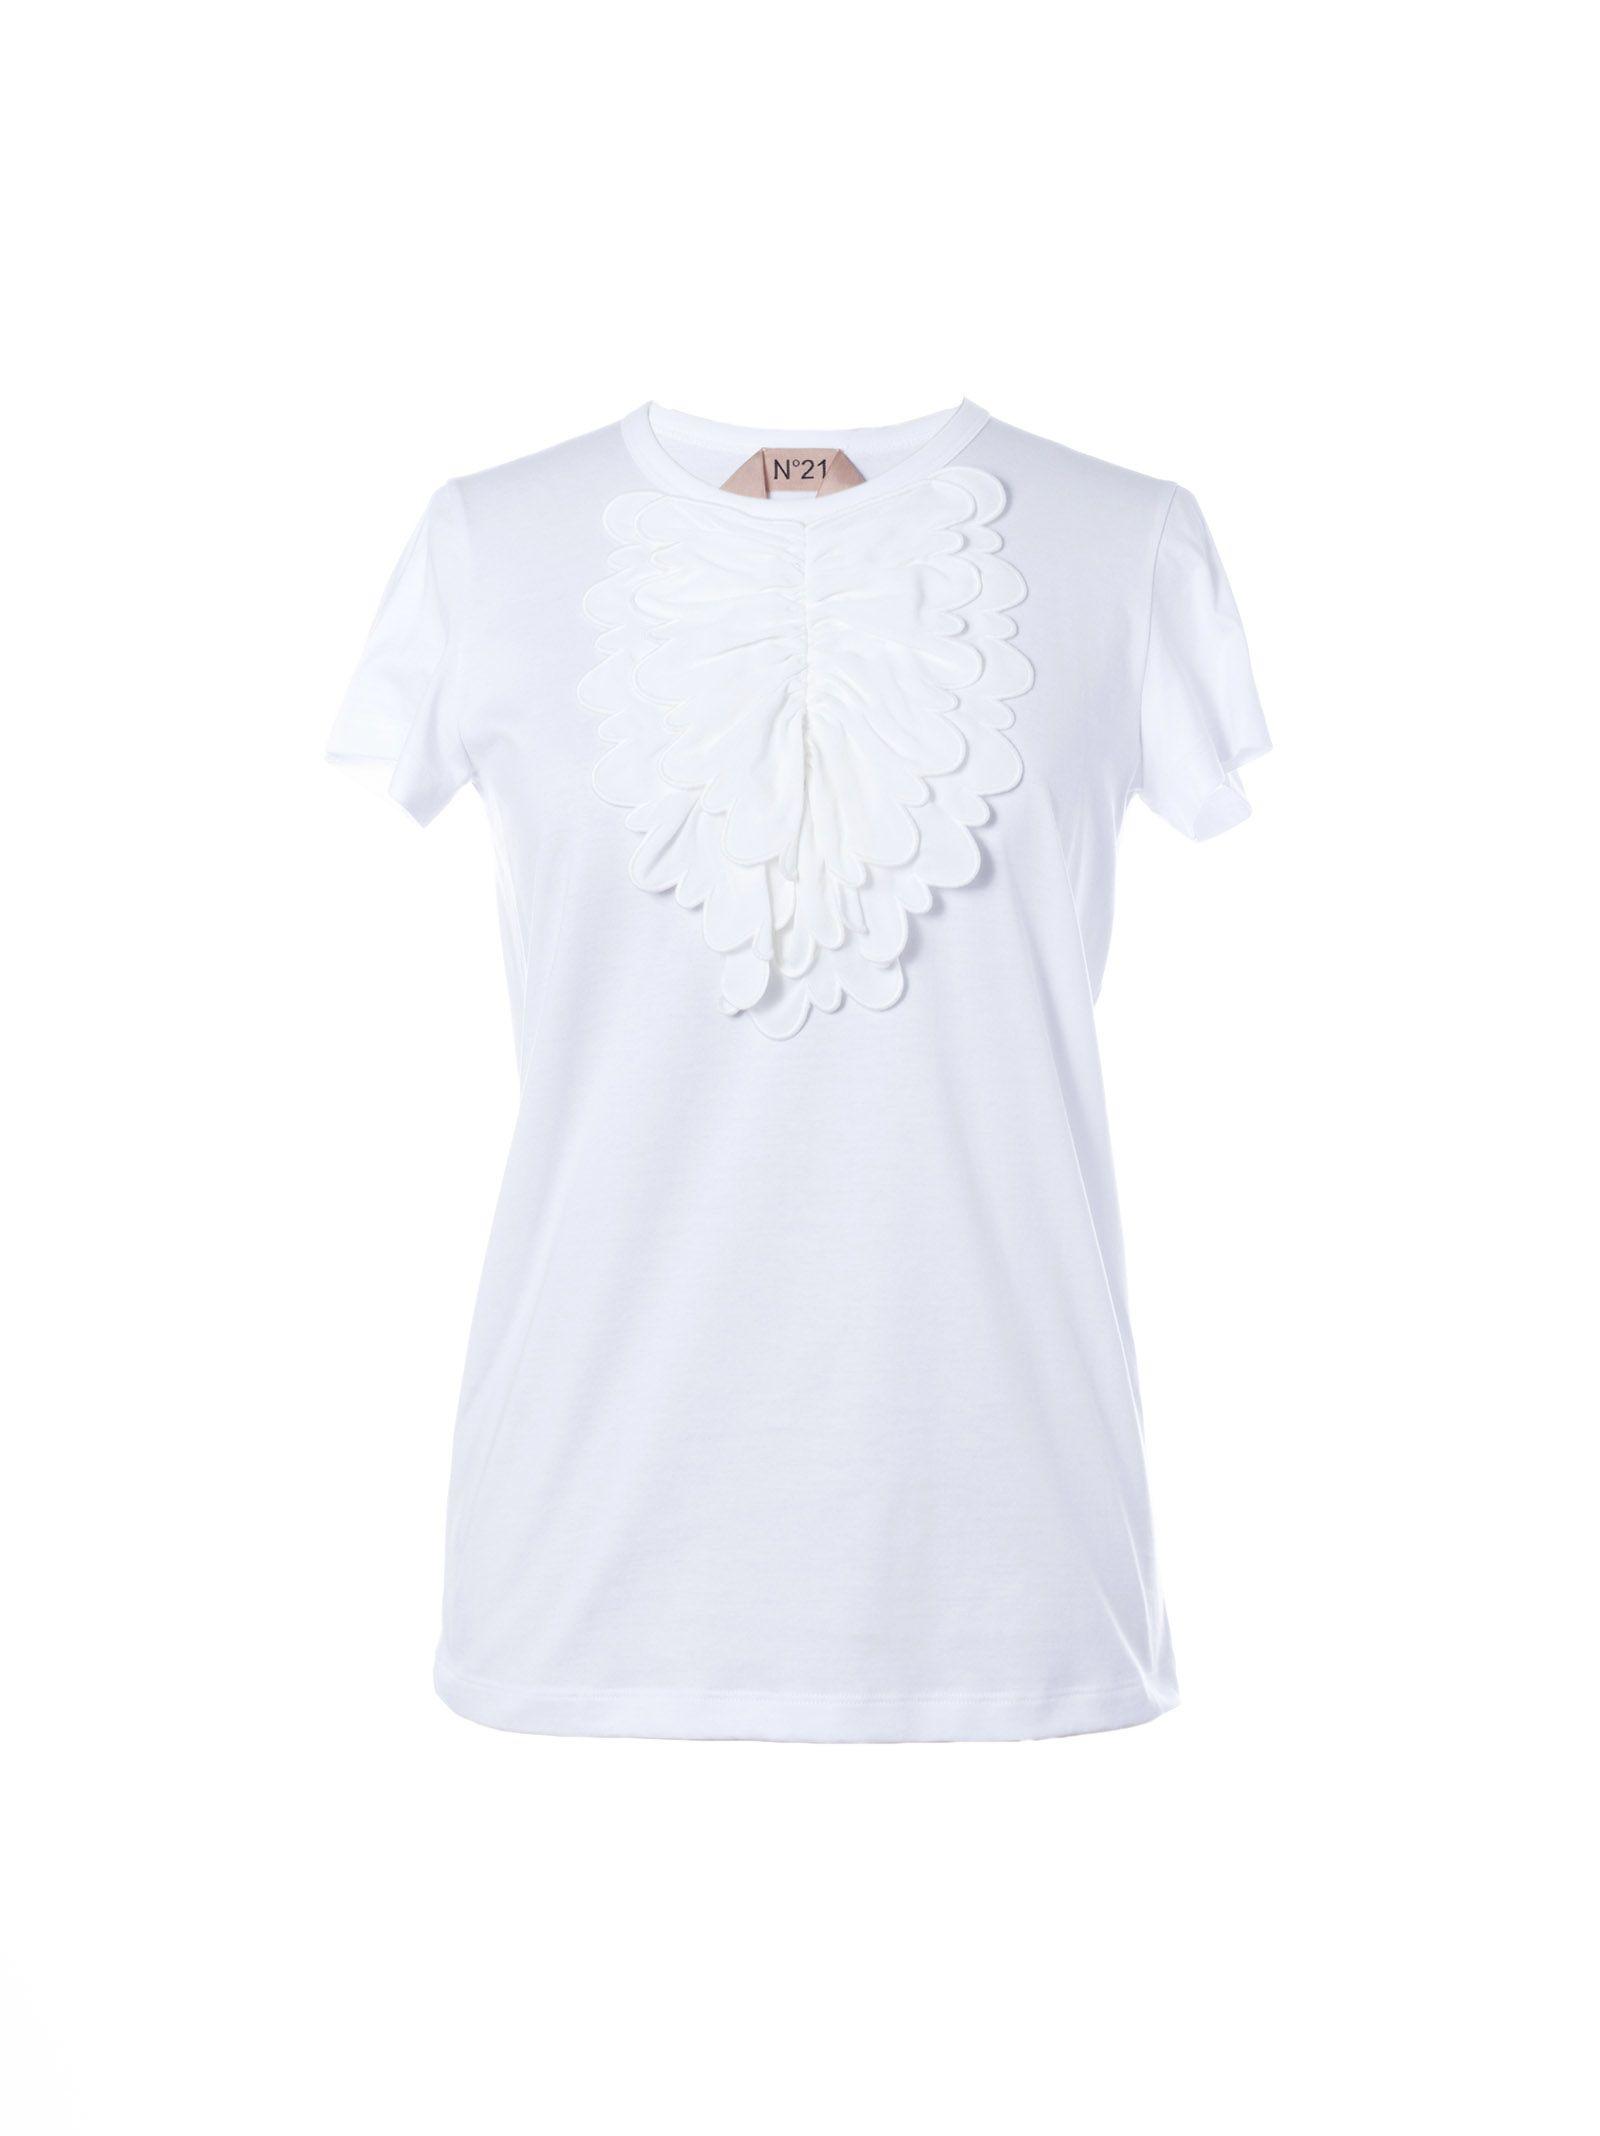 N.21 Scalloped Bib T-shirt